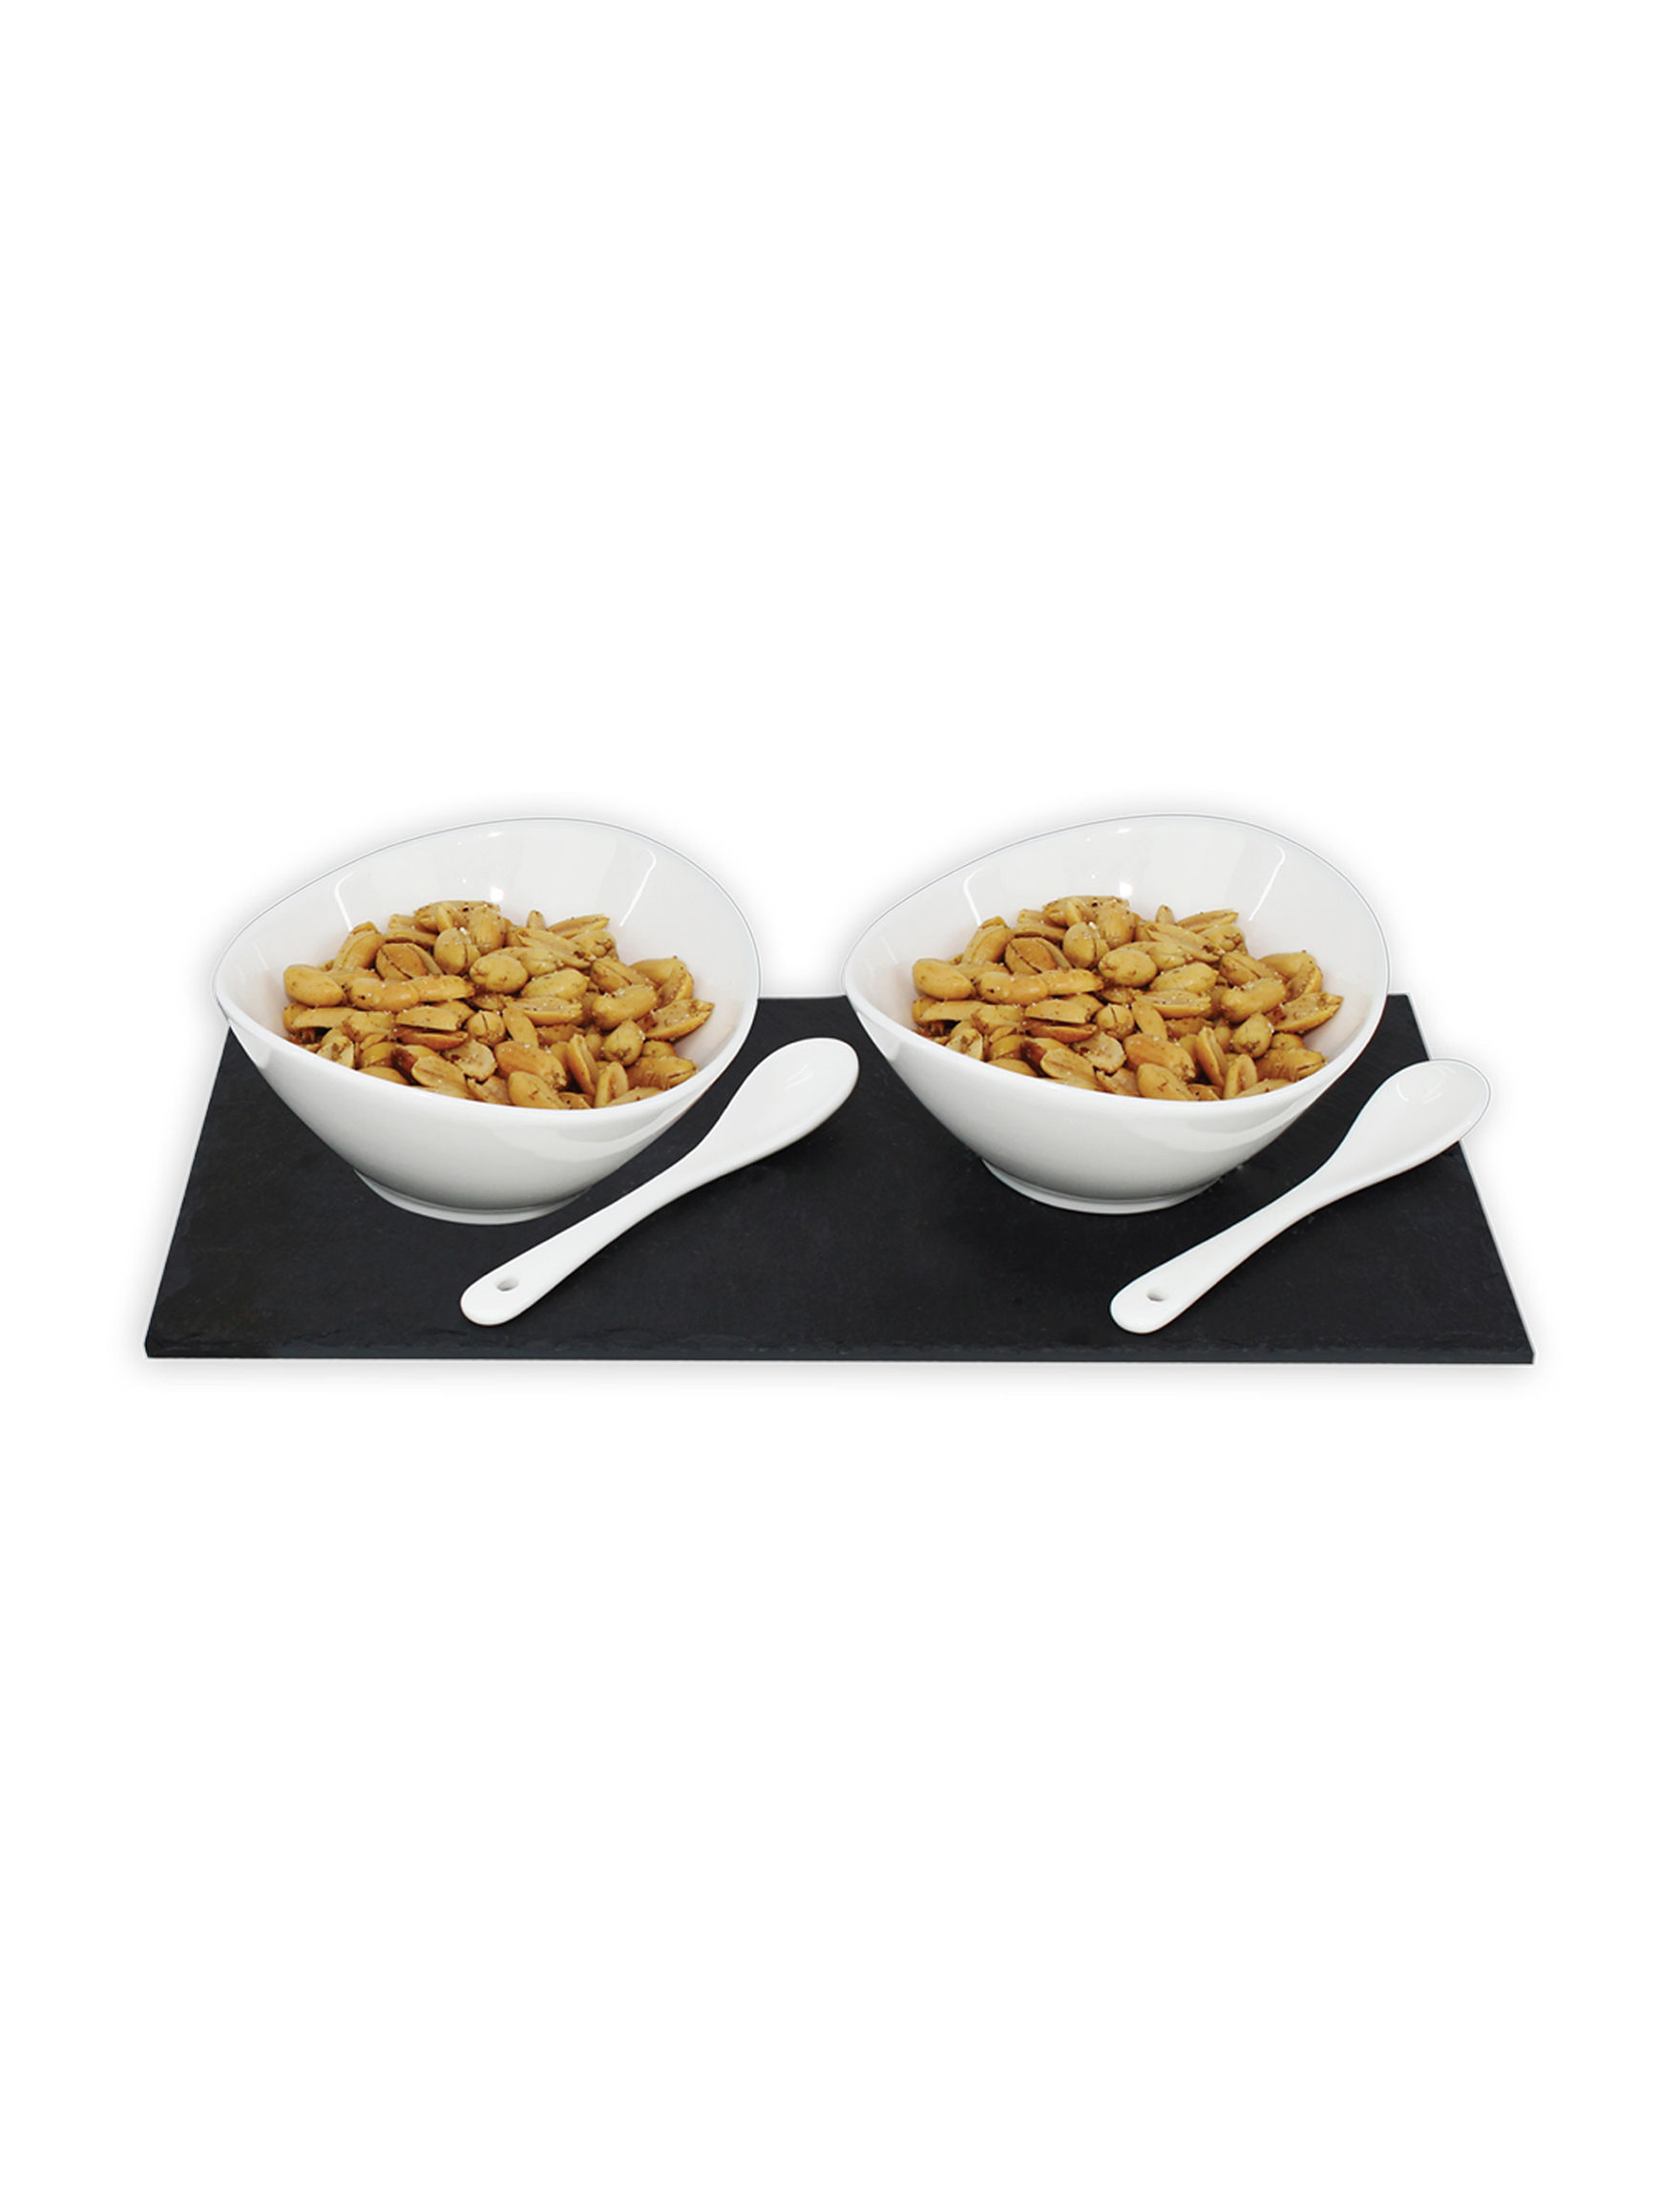 Grand Innovation White Dip & Condiment Bowls Serveware